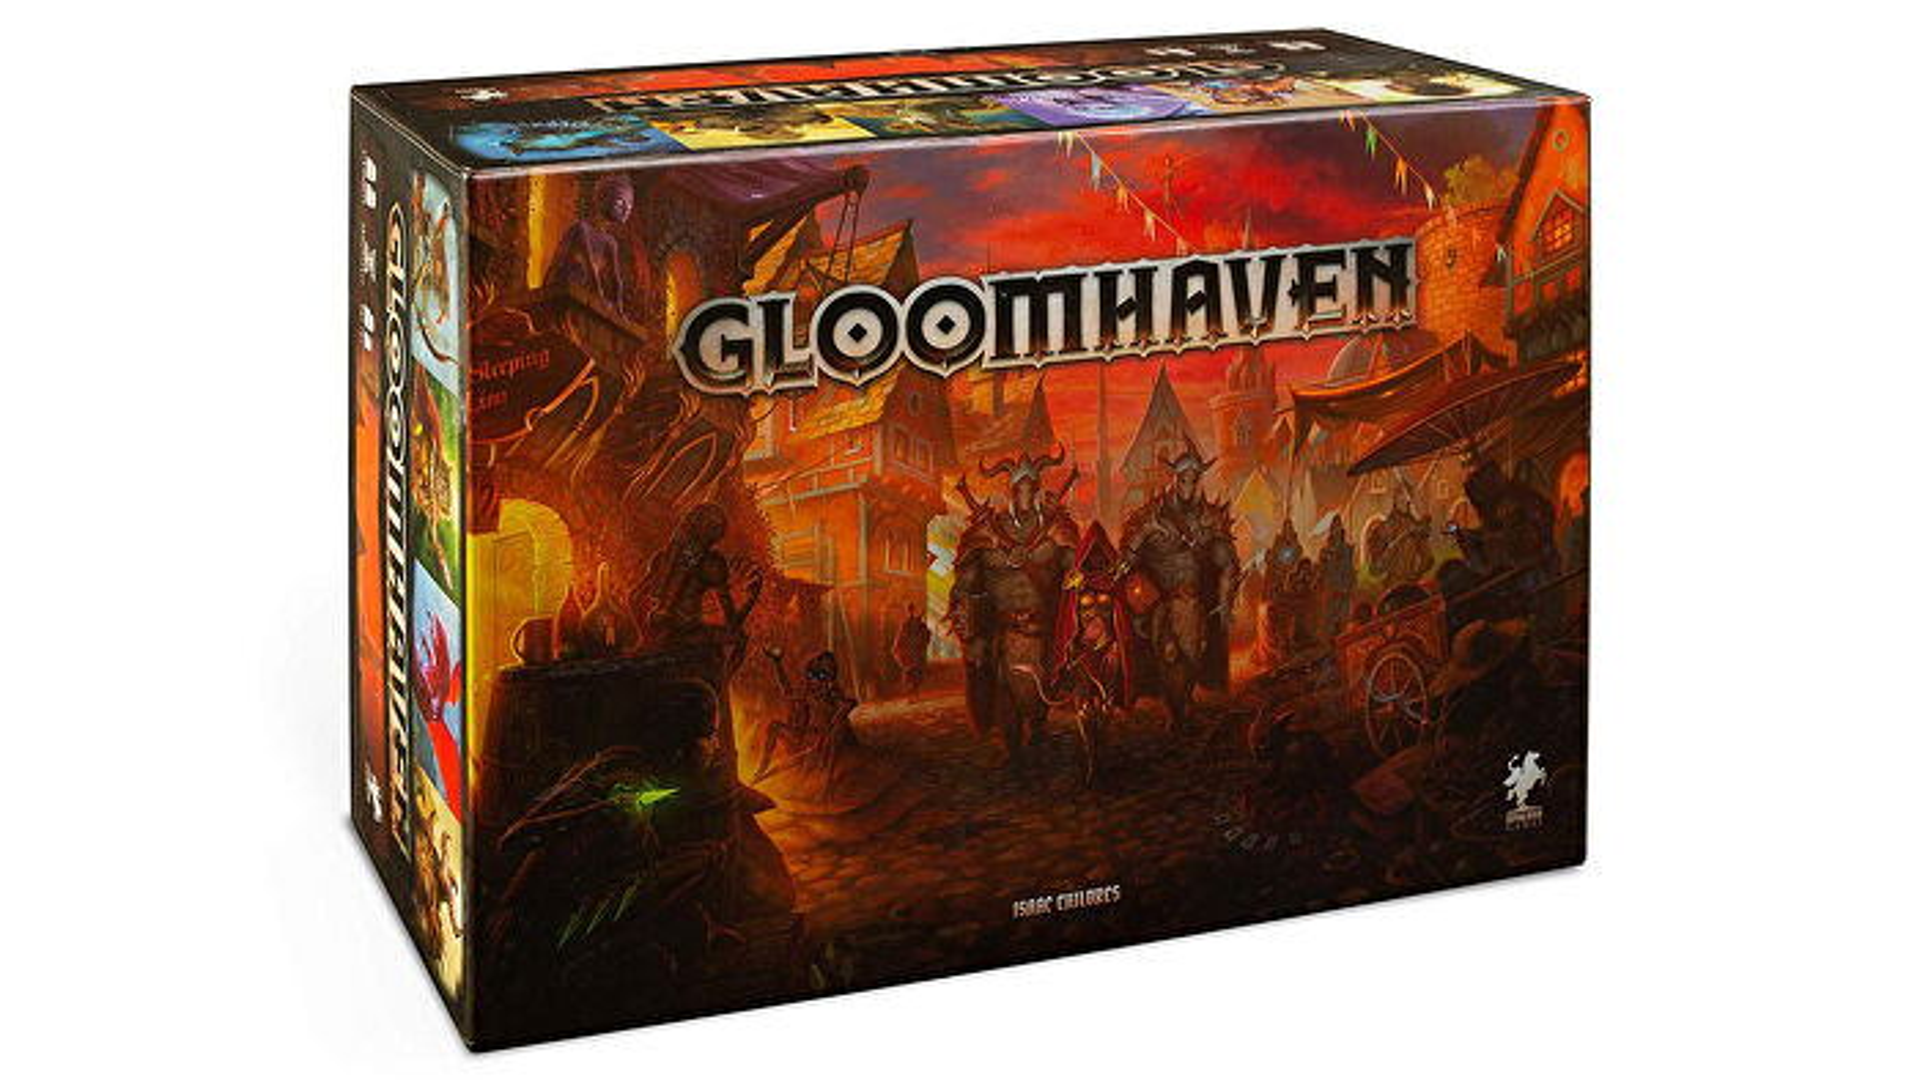 Gloomhaven strategy board game box